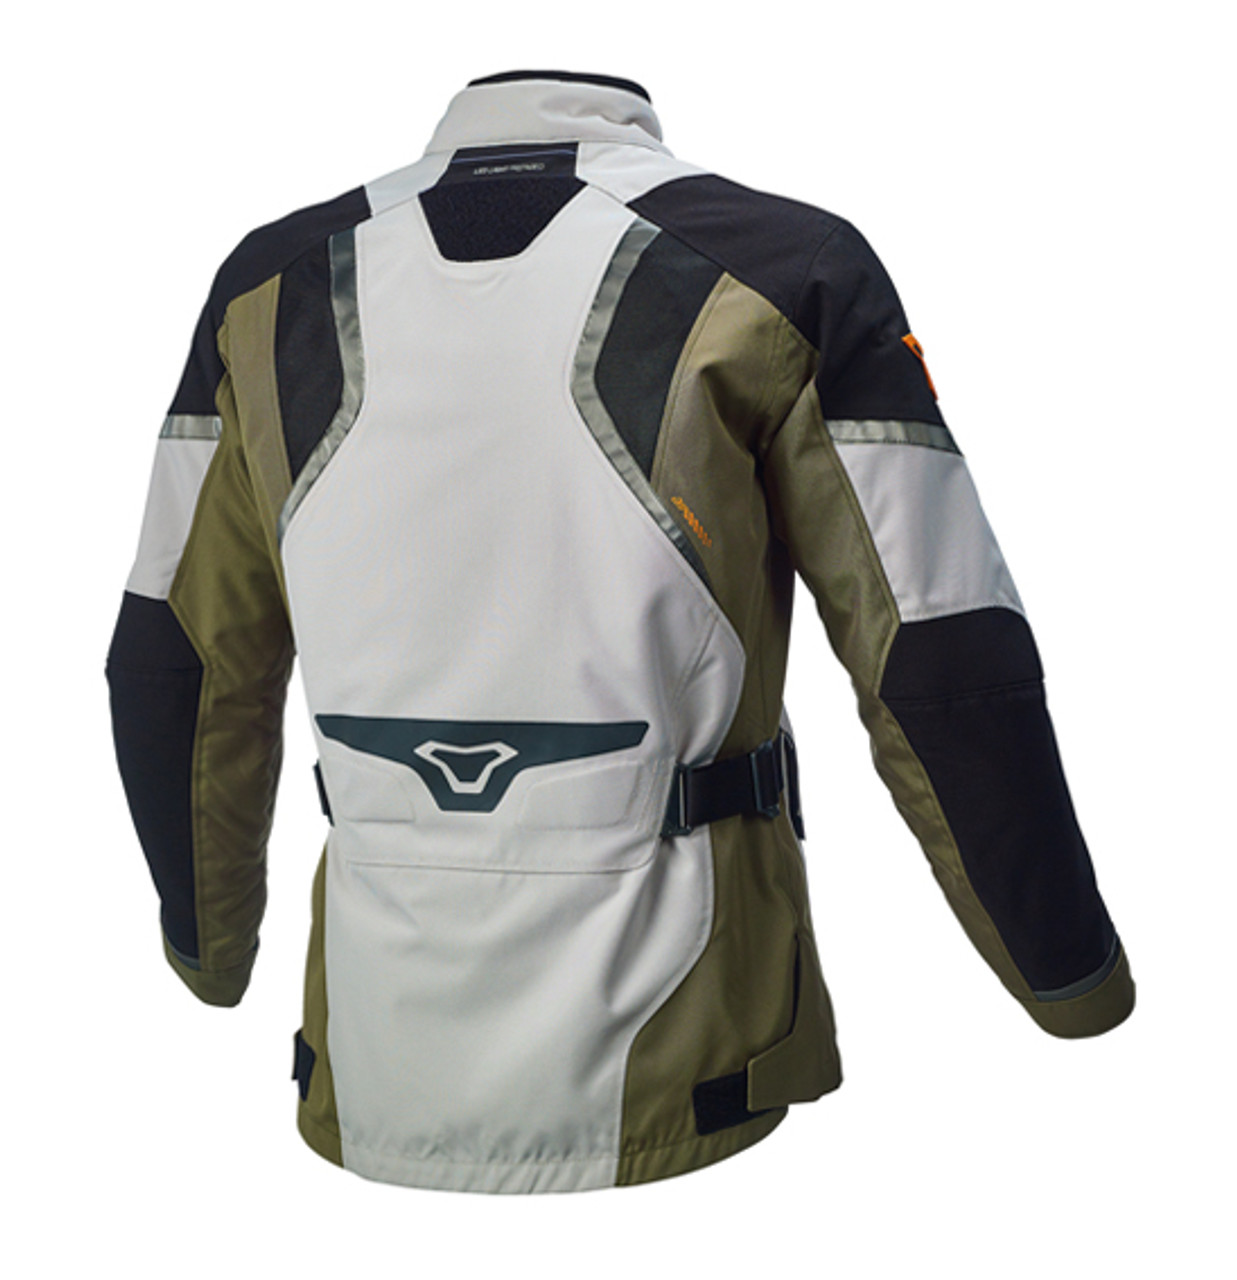 Macna Epitude Motorcycle Jacket - Men, Waterproof, Light Grey / Black / Grey